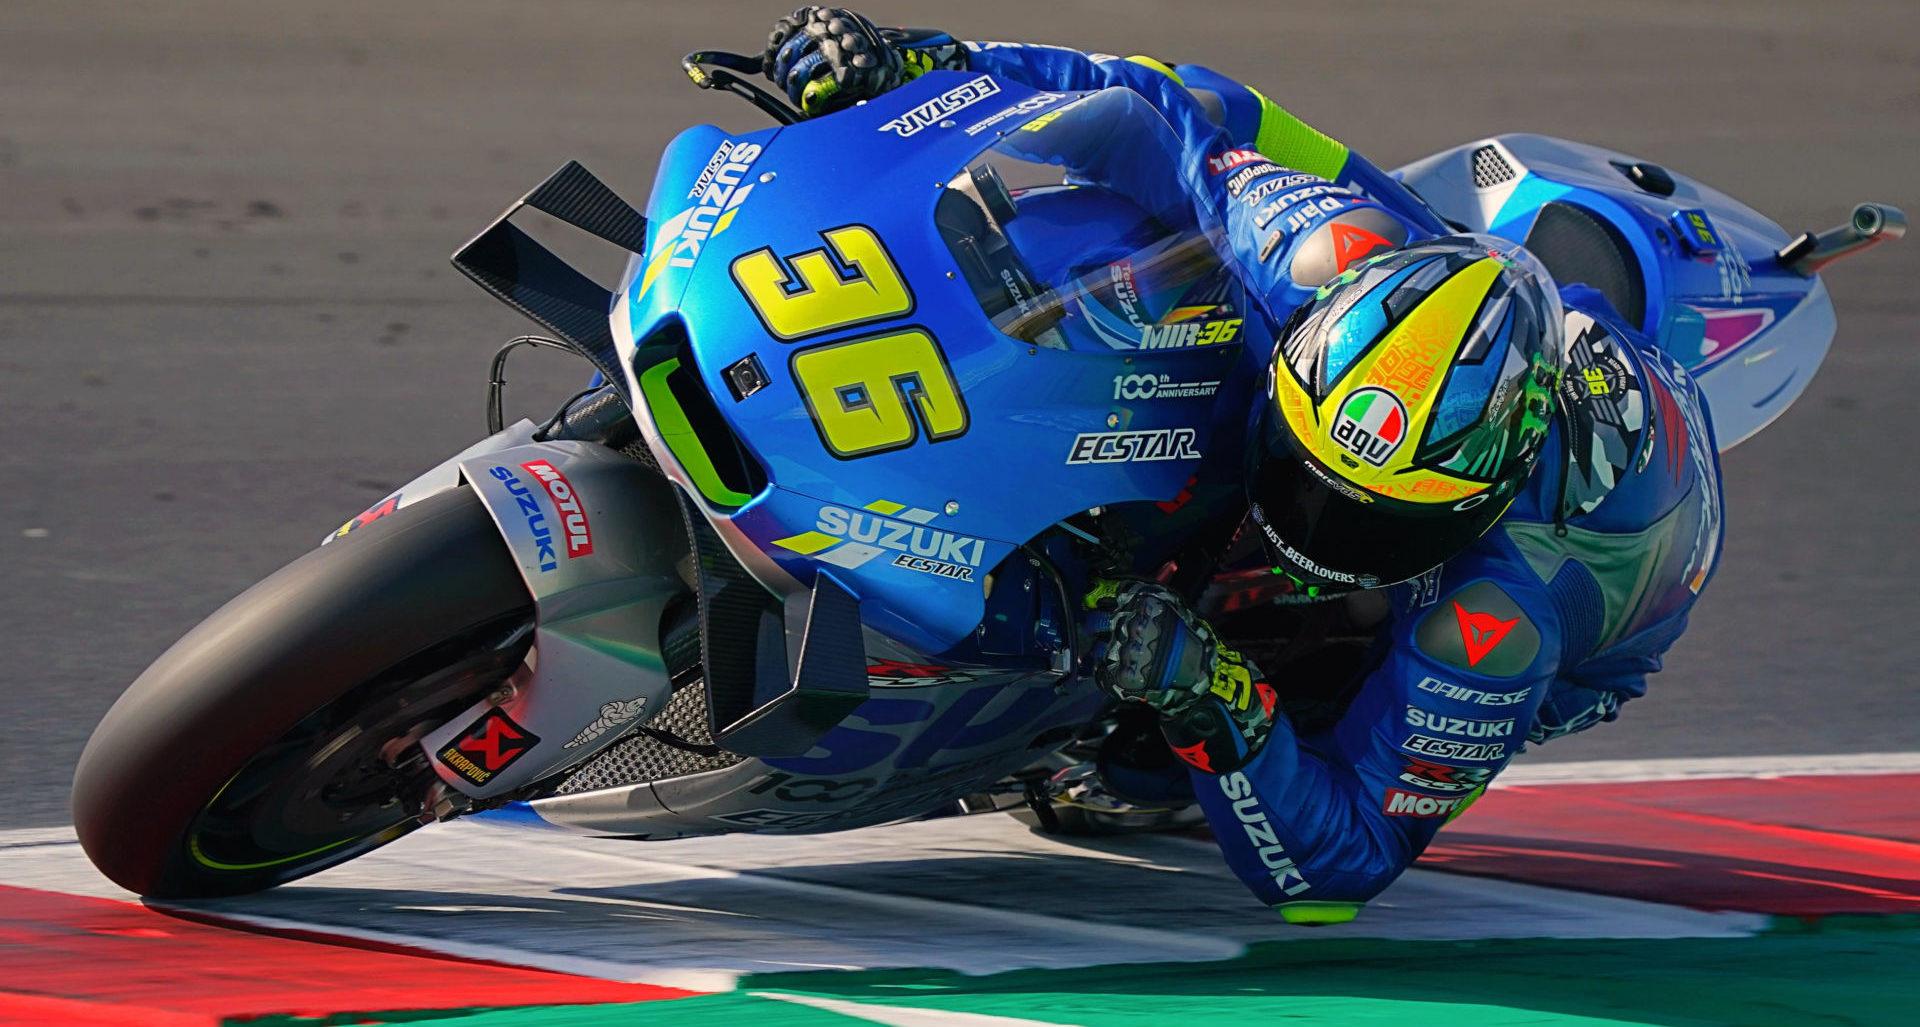 Joan Mir (36) leads the 2020 MotoGP World Championship in spite of not having won a race this season. Photo courtesy Team Suzuki Press Office.